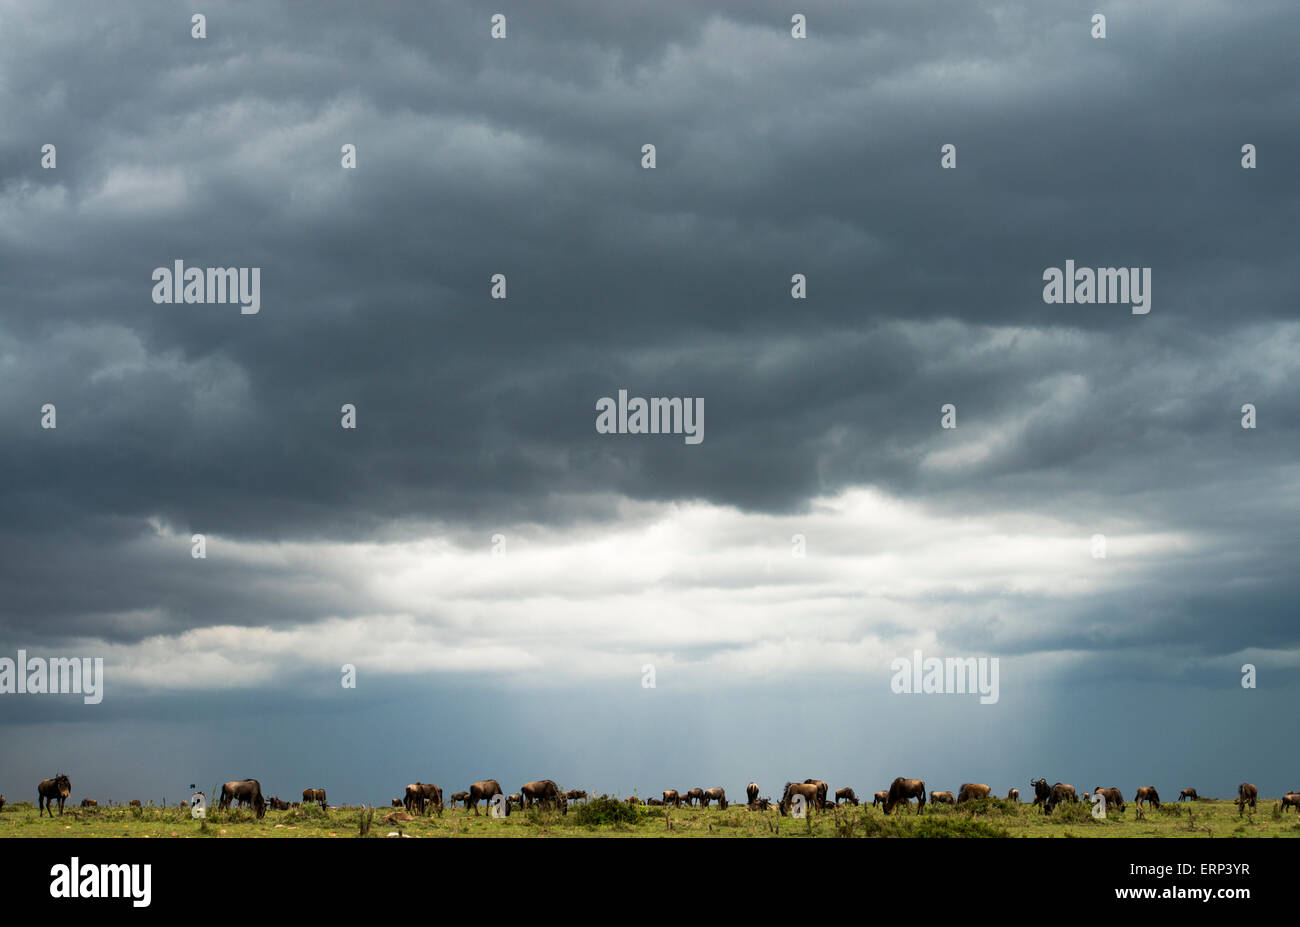 Blue wildebeests (Connochaetes taurinus) migration Olare Orok Conservancy Kenya Africa - Stock Image